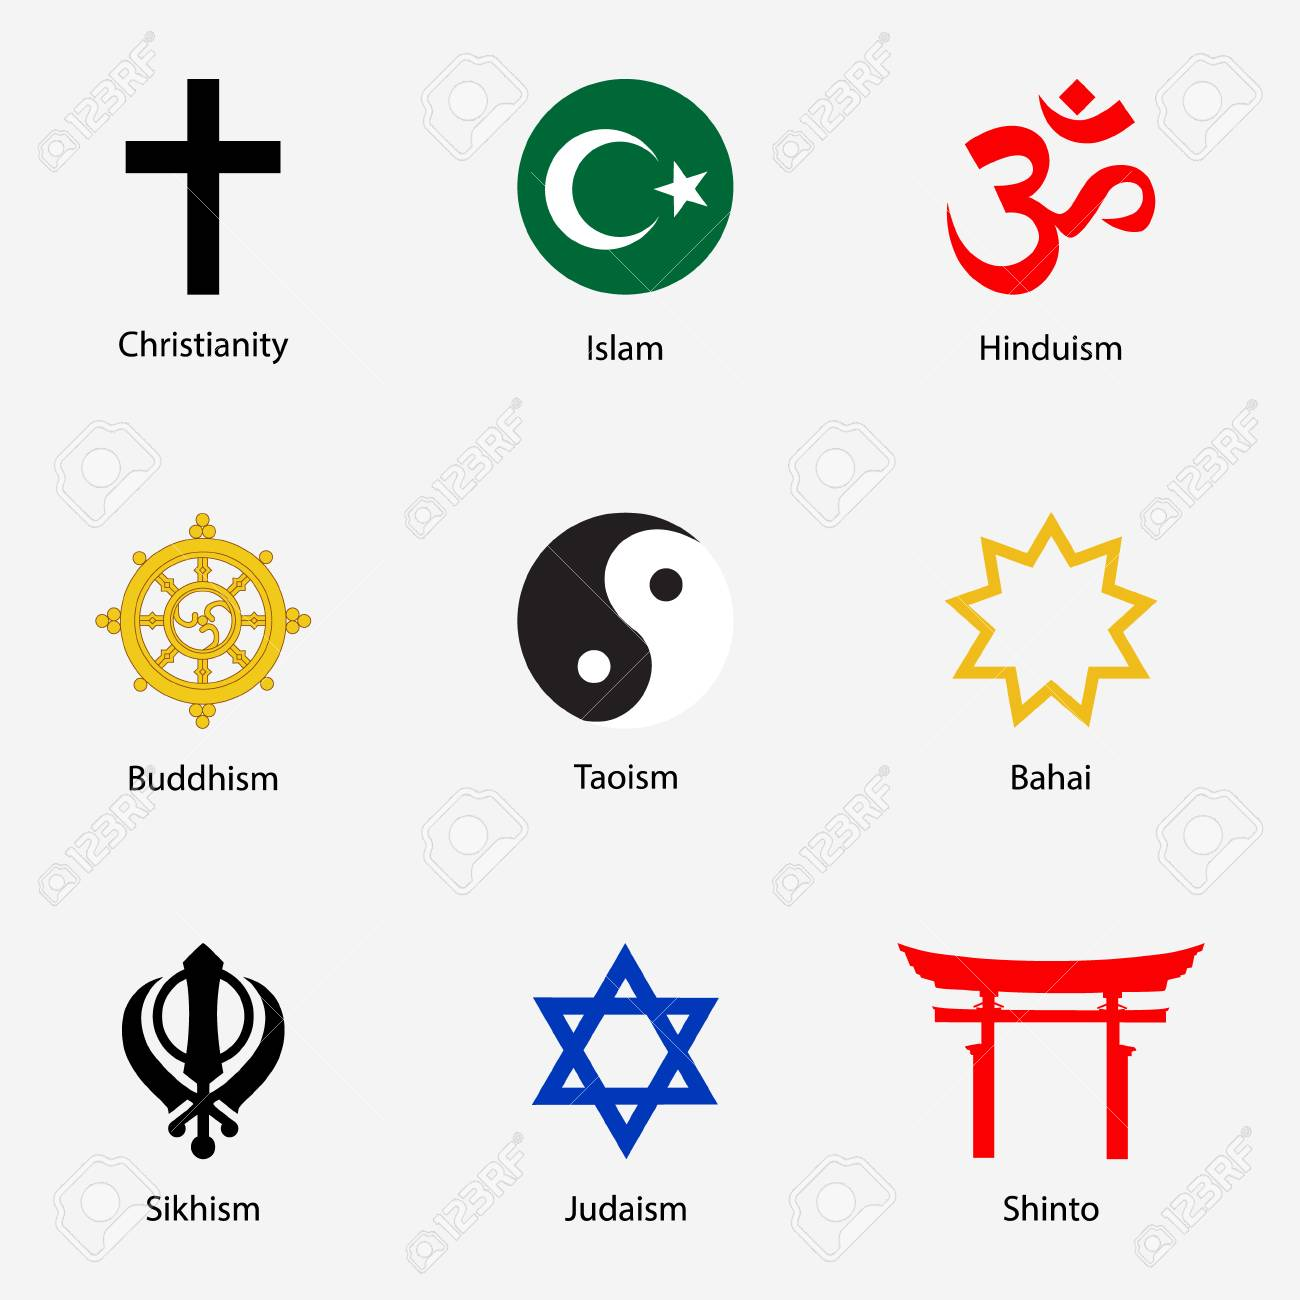 Raster Illustration Set Of Religious Symbols With Names Stock Photo